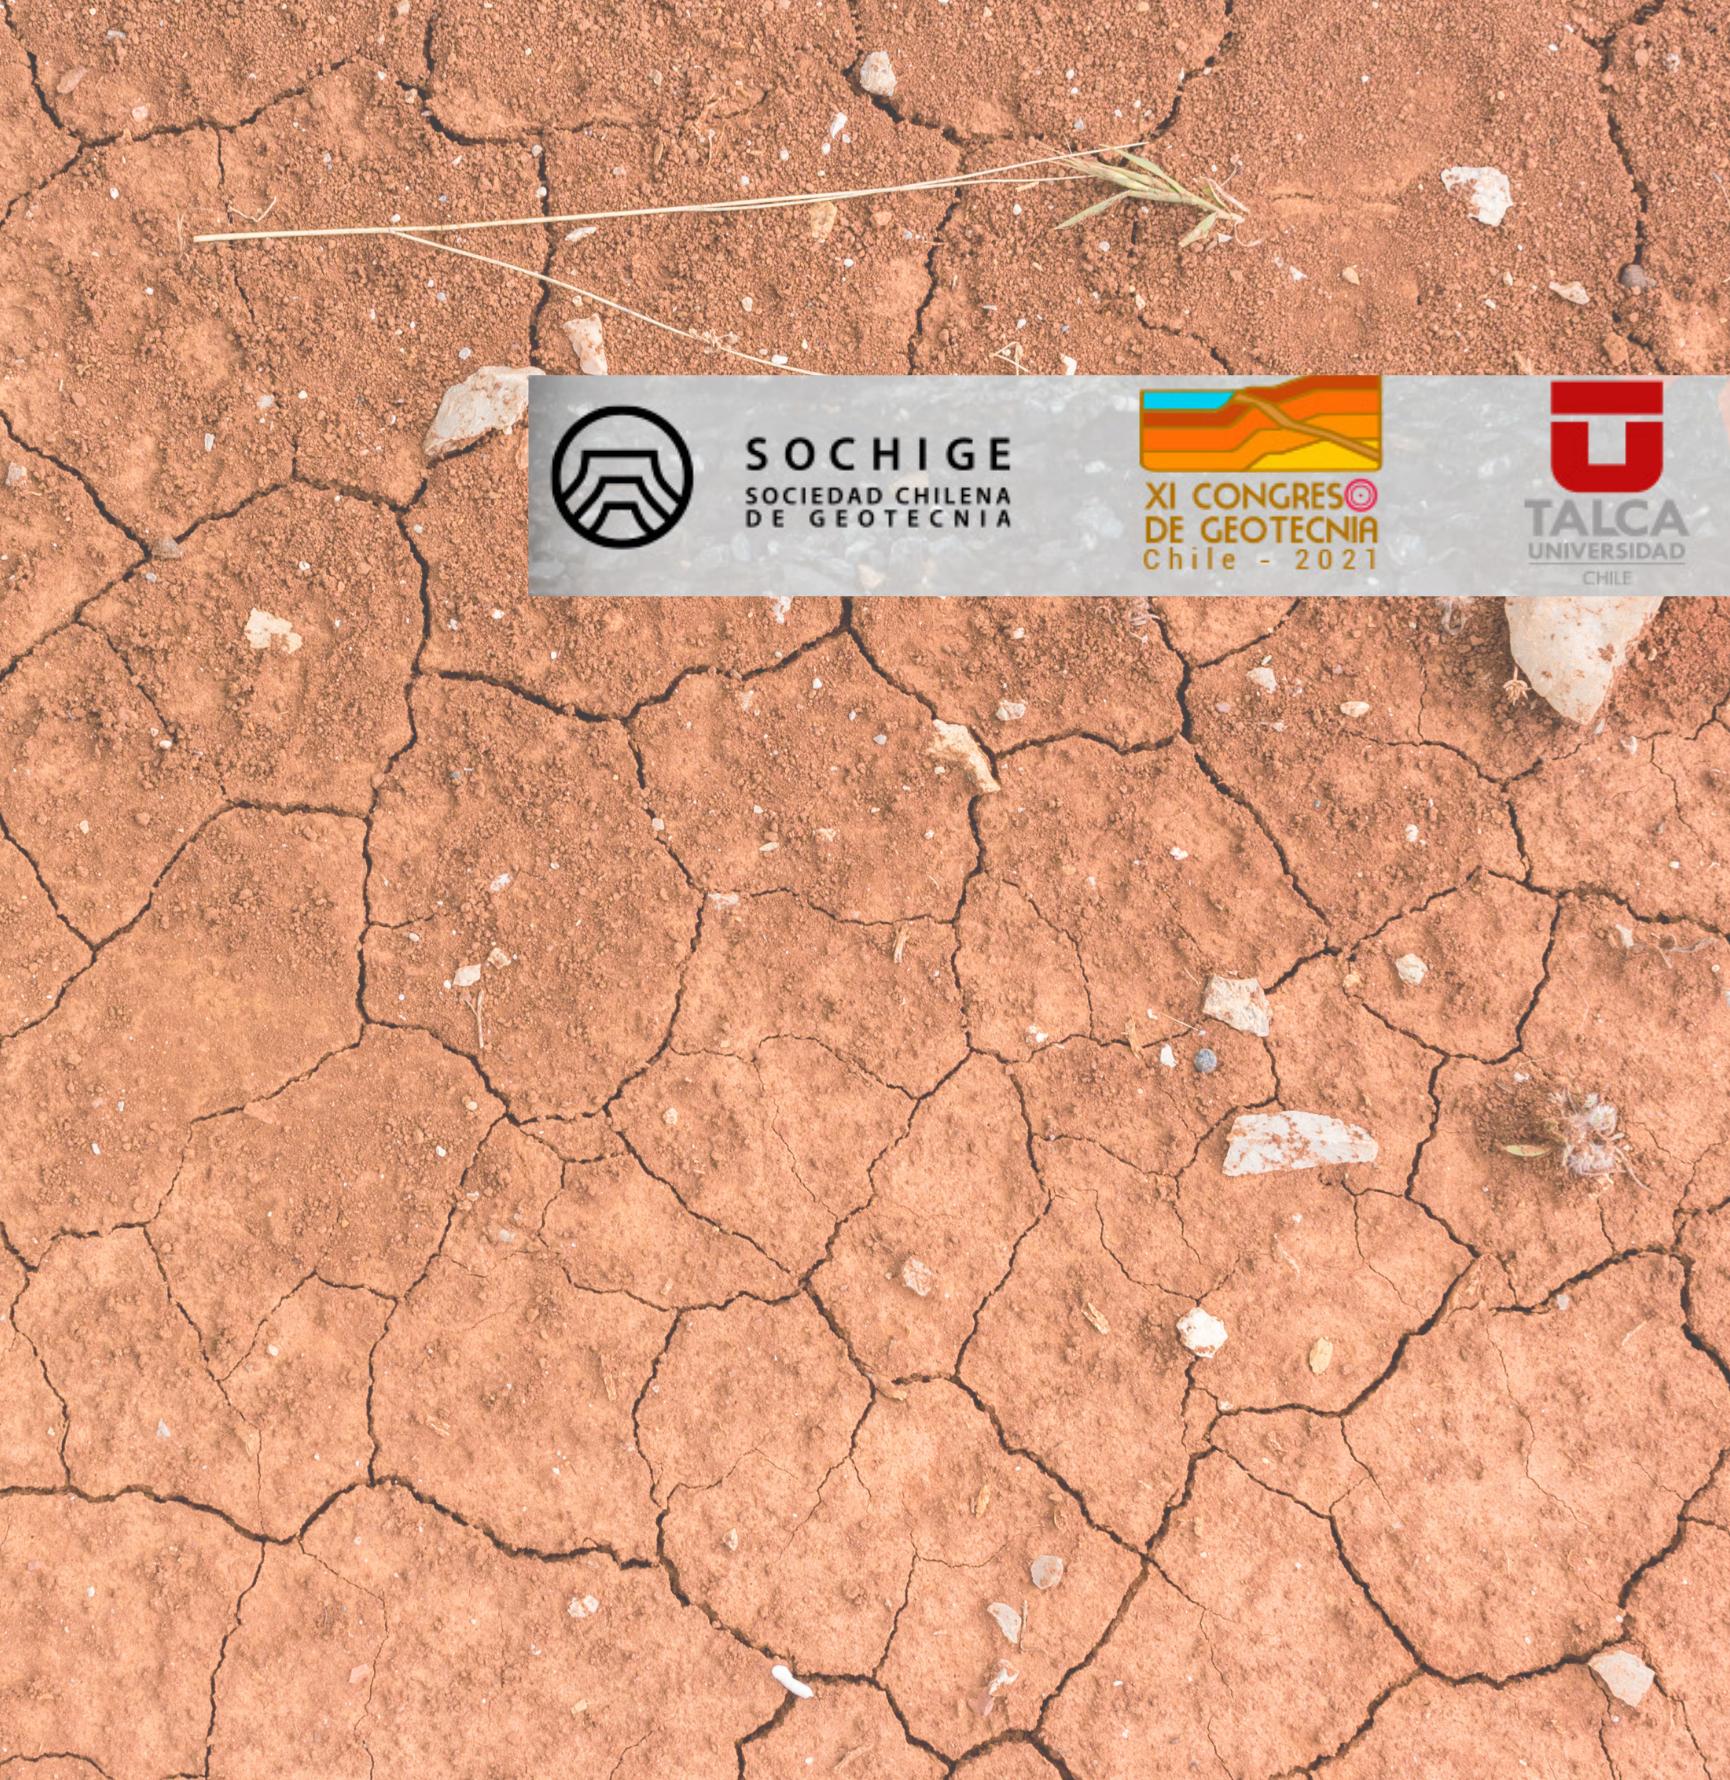 XI CONGRESO CHILENO DE GEOTECNIA | SAIG